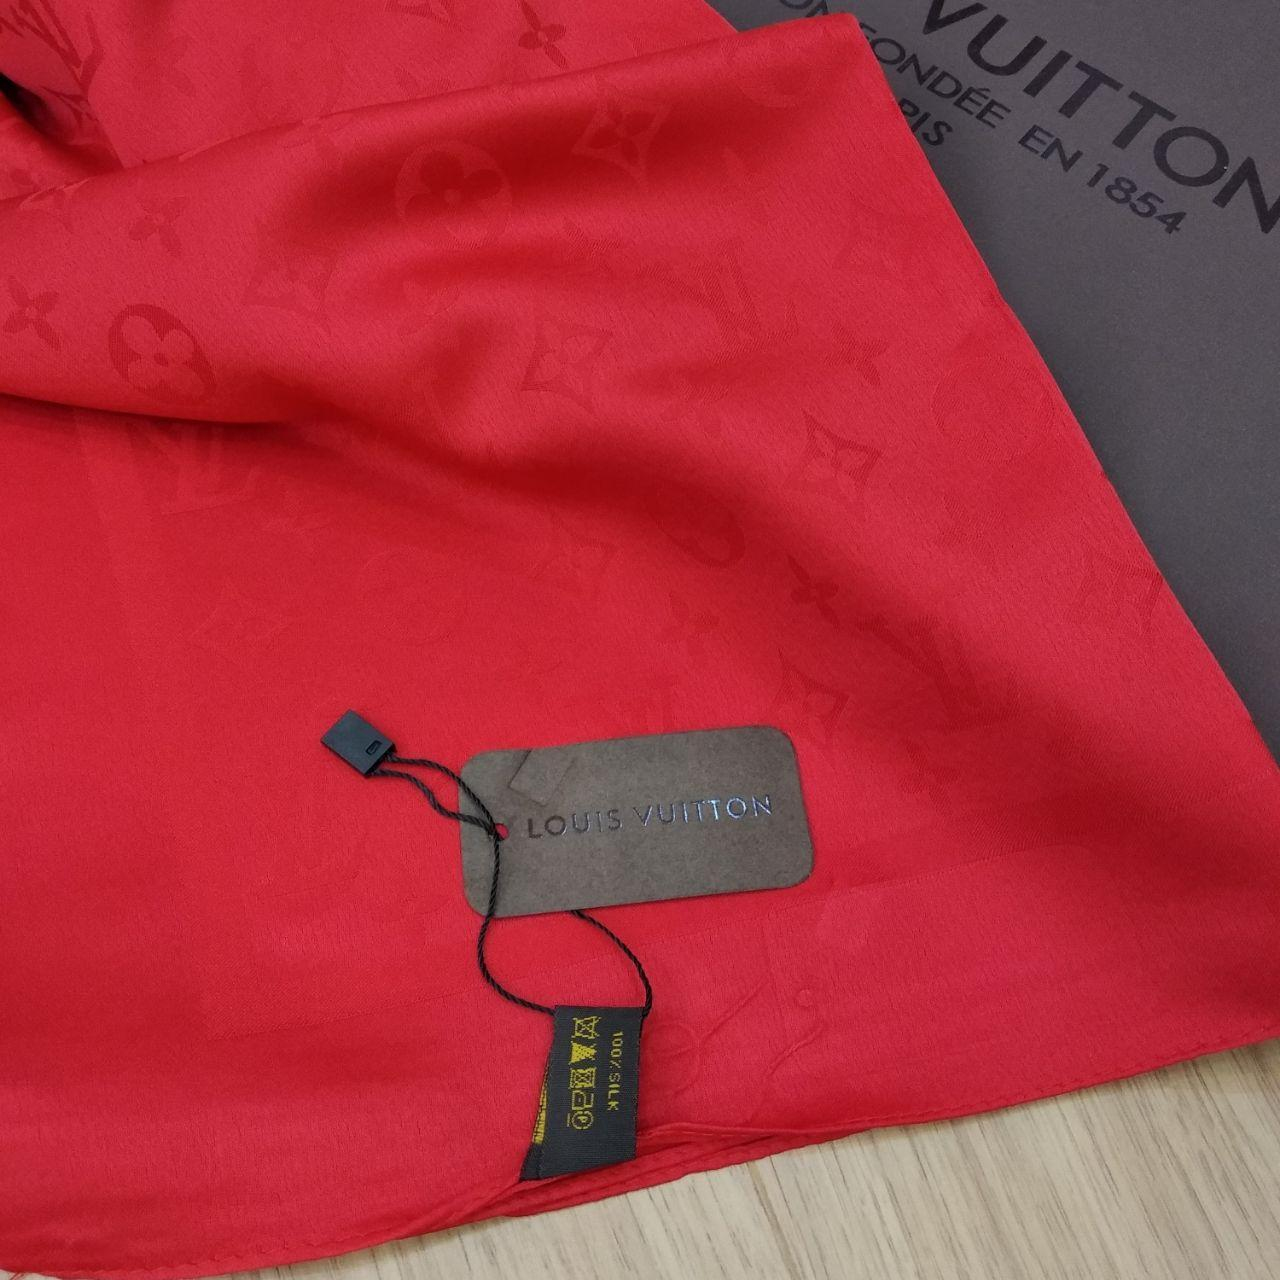 Платок Louis Vuitton шелк красный